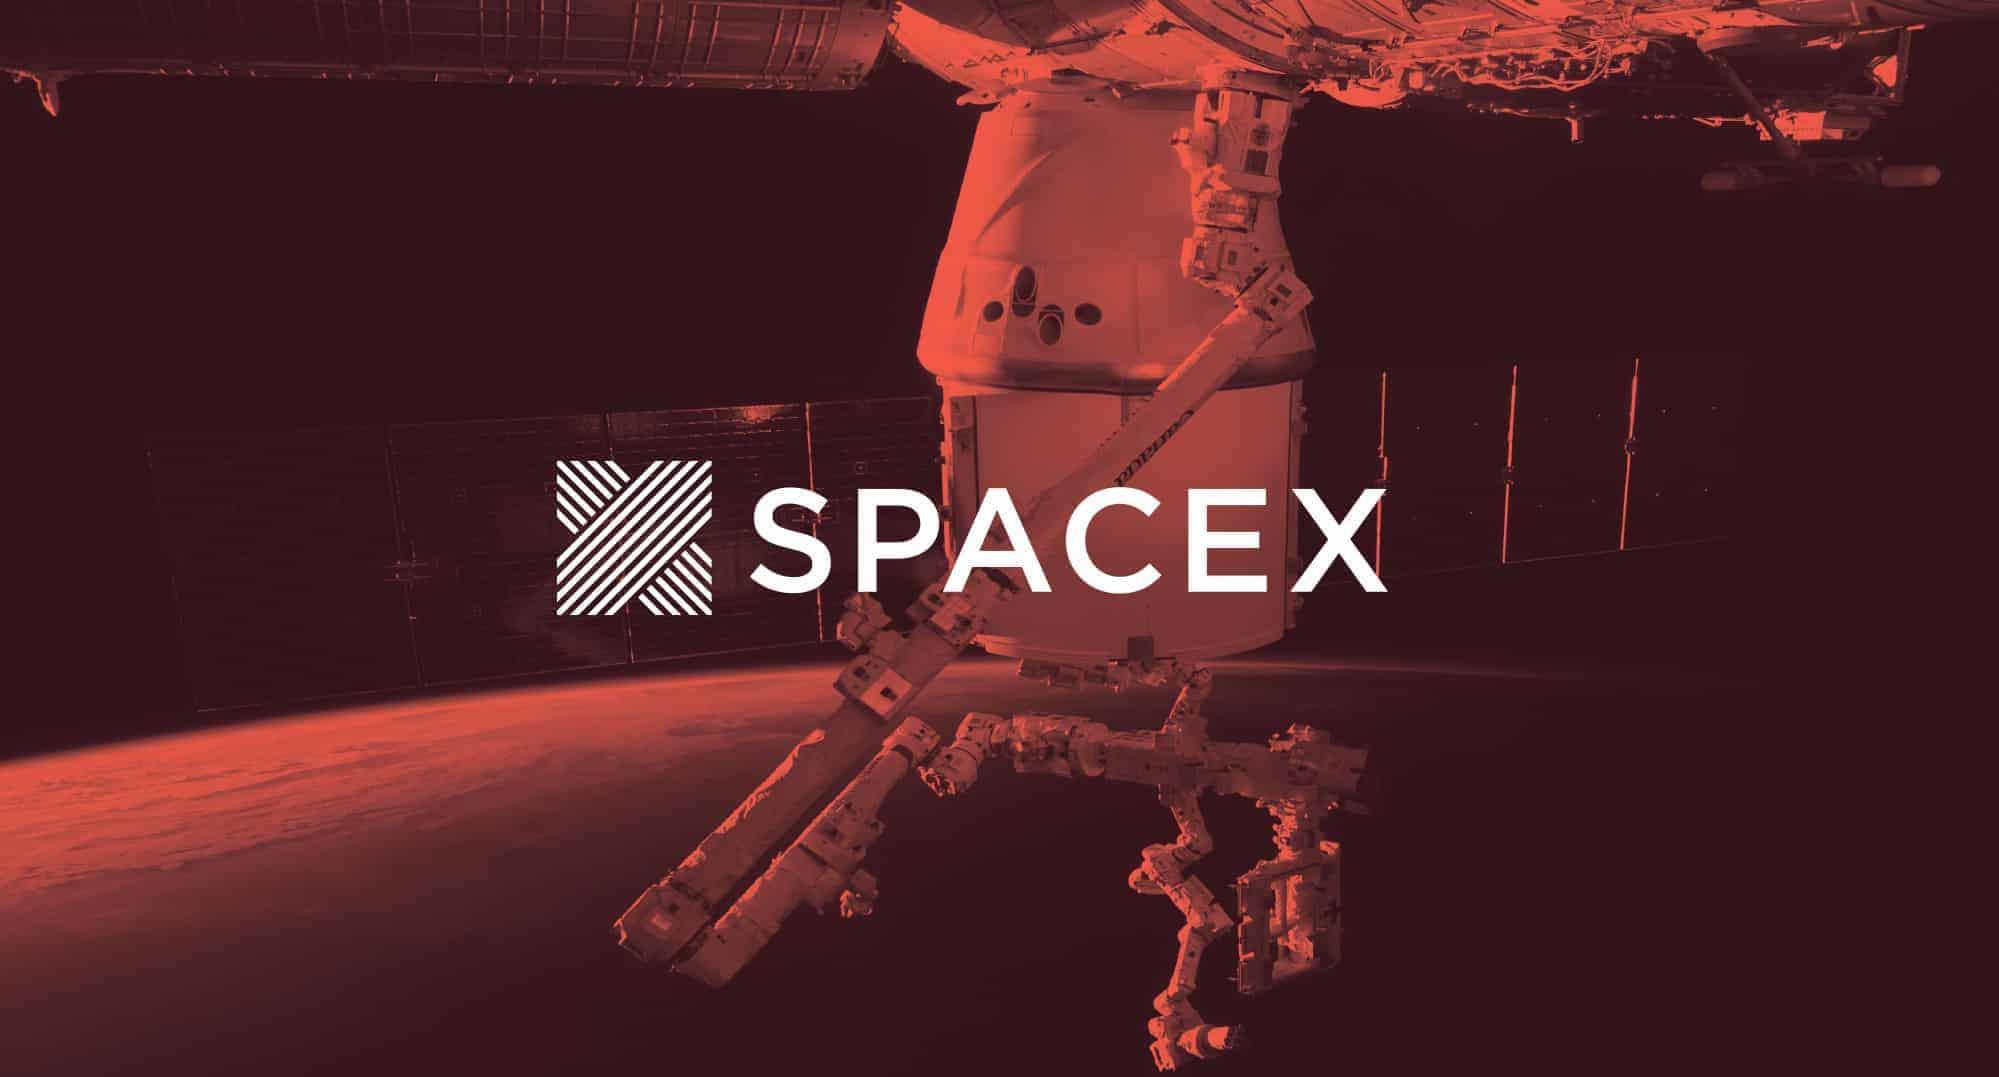 SpaceX Rebranding